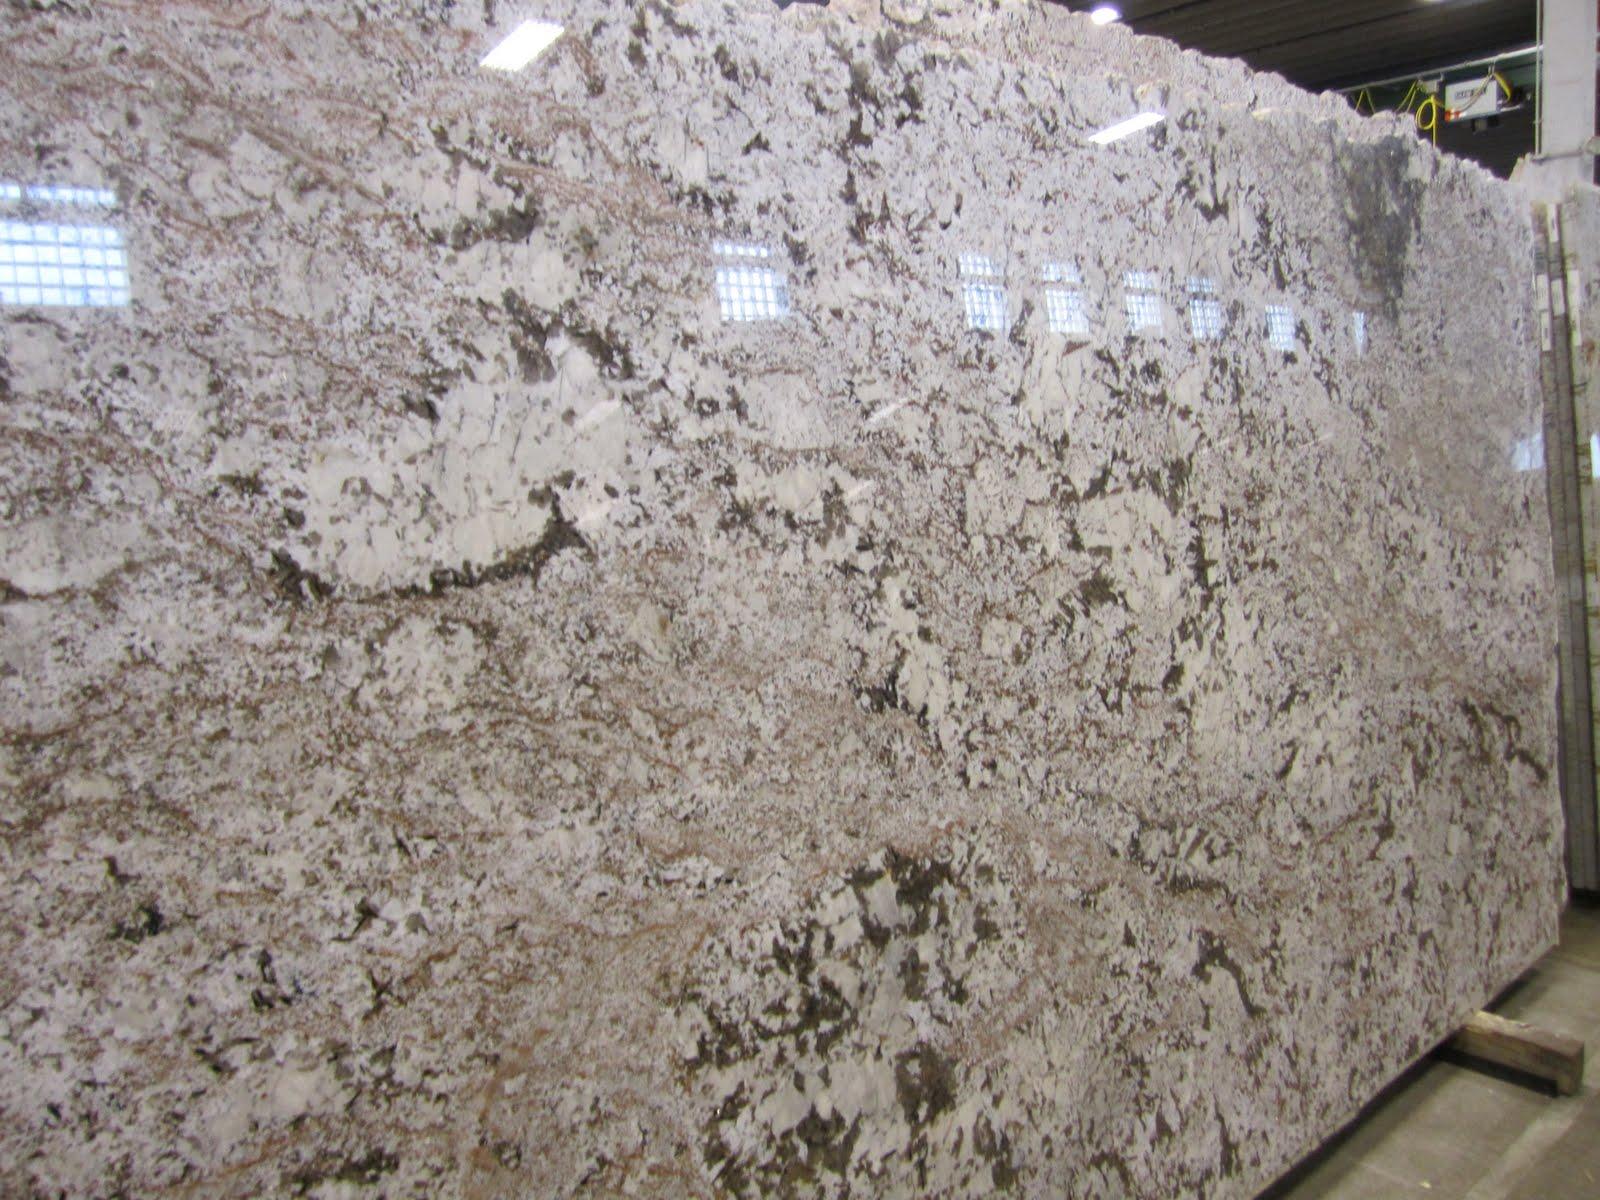 Bianco Antico Granite : USC granite: Bianco Antico 123 x 67, 115 x 72, 113 x 60